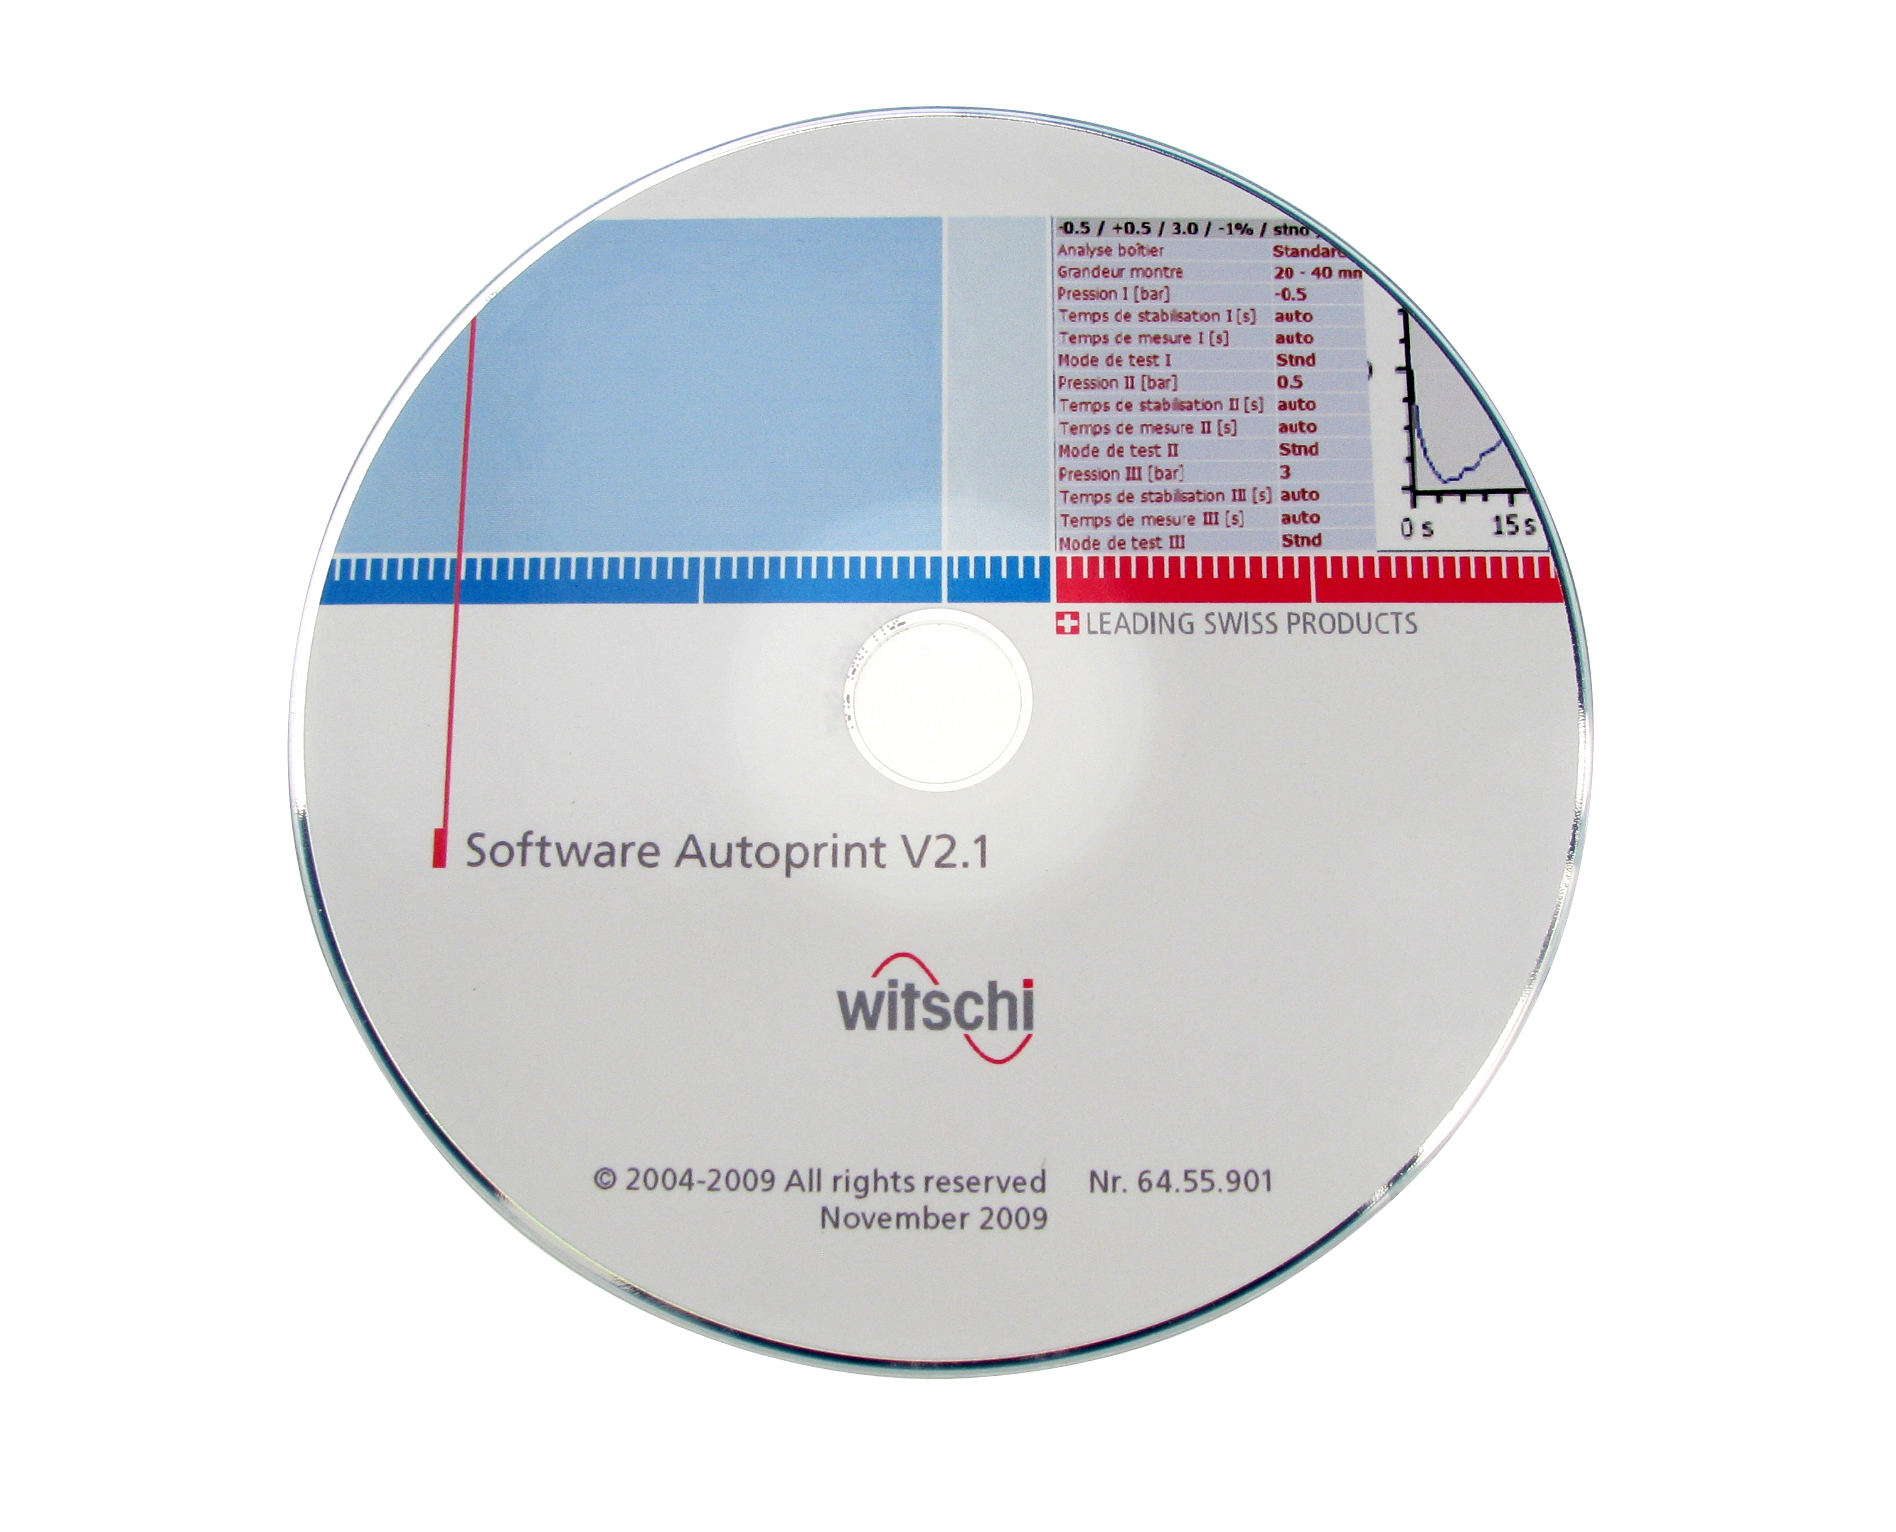 PC-software Autoprint op cd-rom